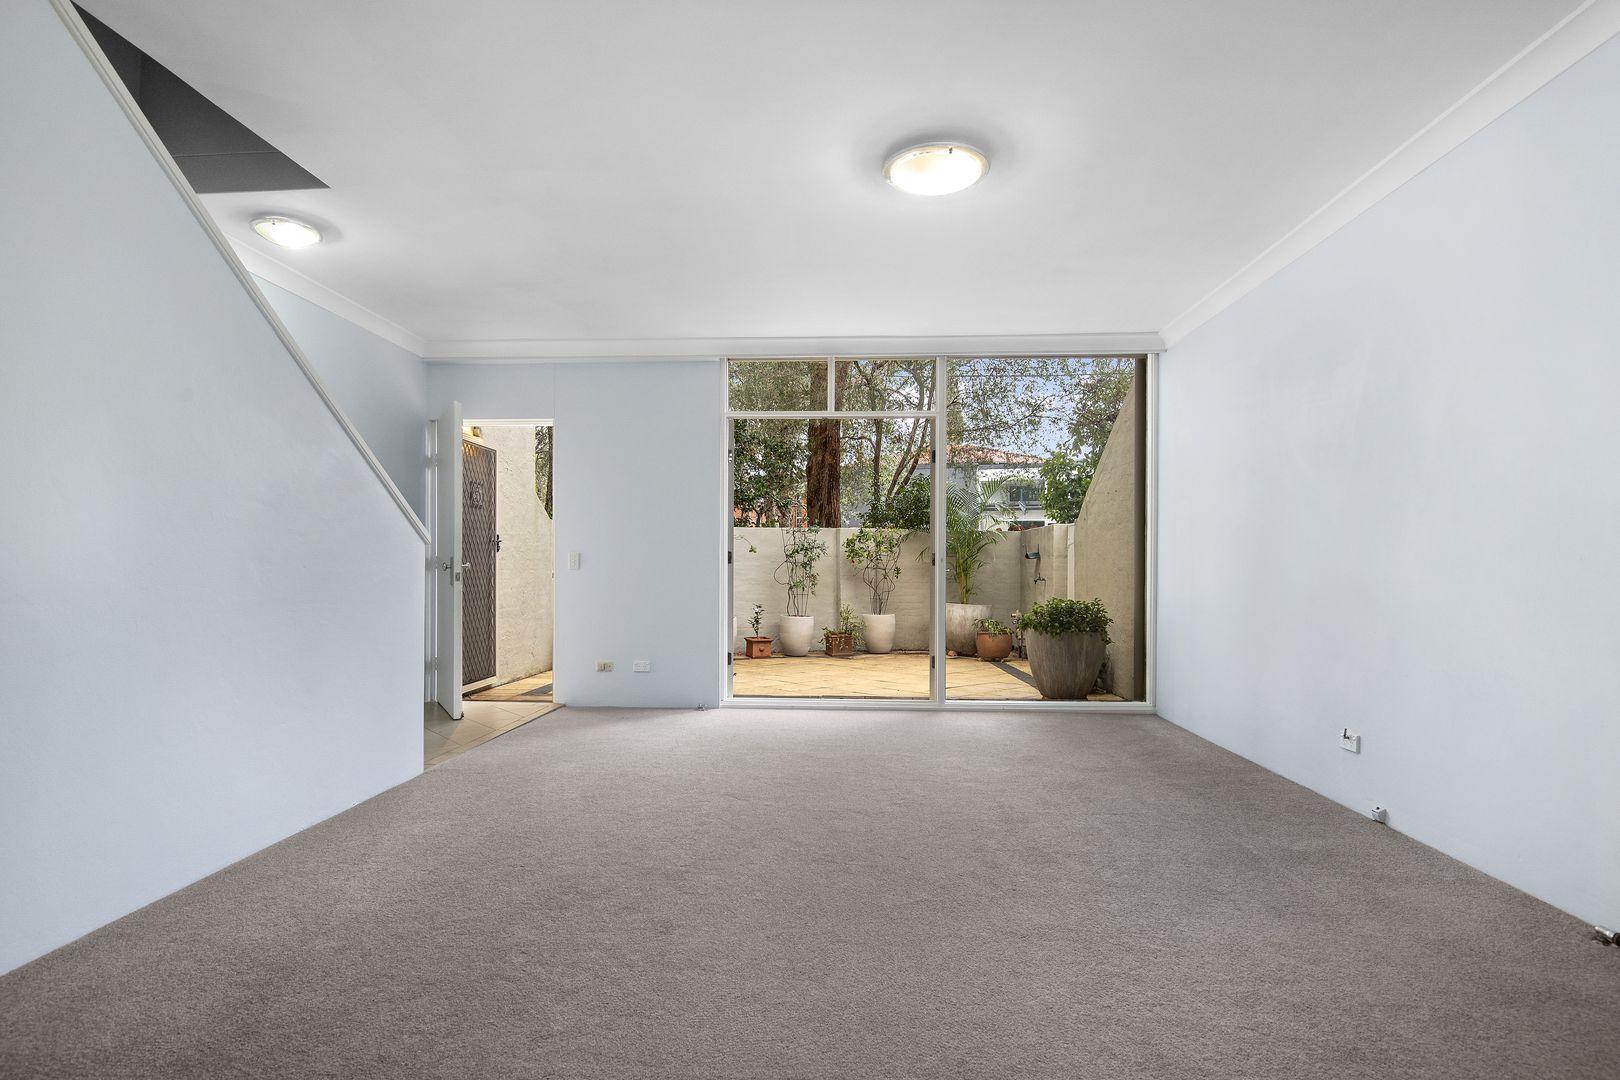 5/27 Boyle Street, Balgowlah NSW 2093 - Townhouse For Rent - $750